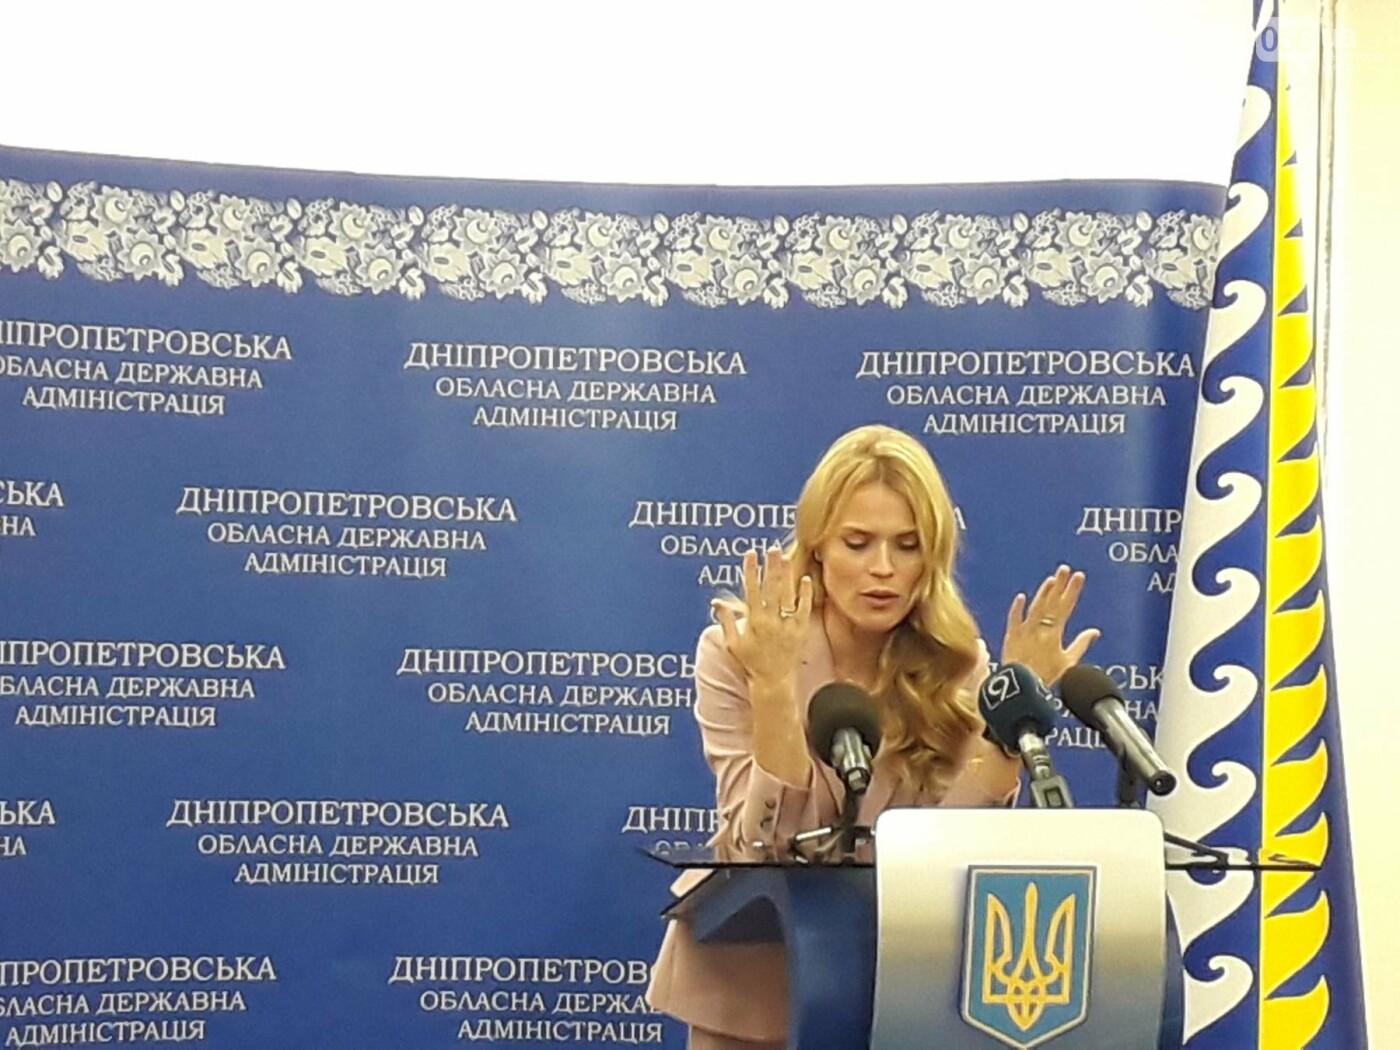 В Днепре Ольга Фреймут презентовала книгу для детей,  - ФОТО, фото-2